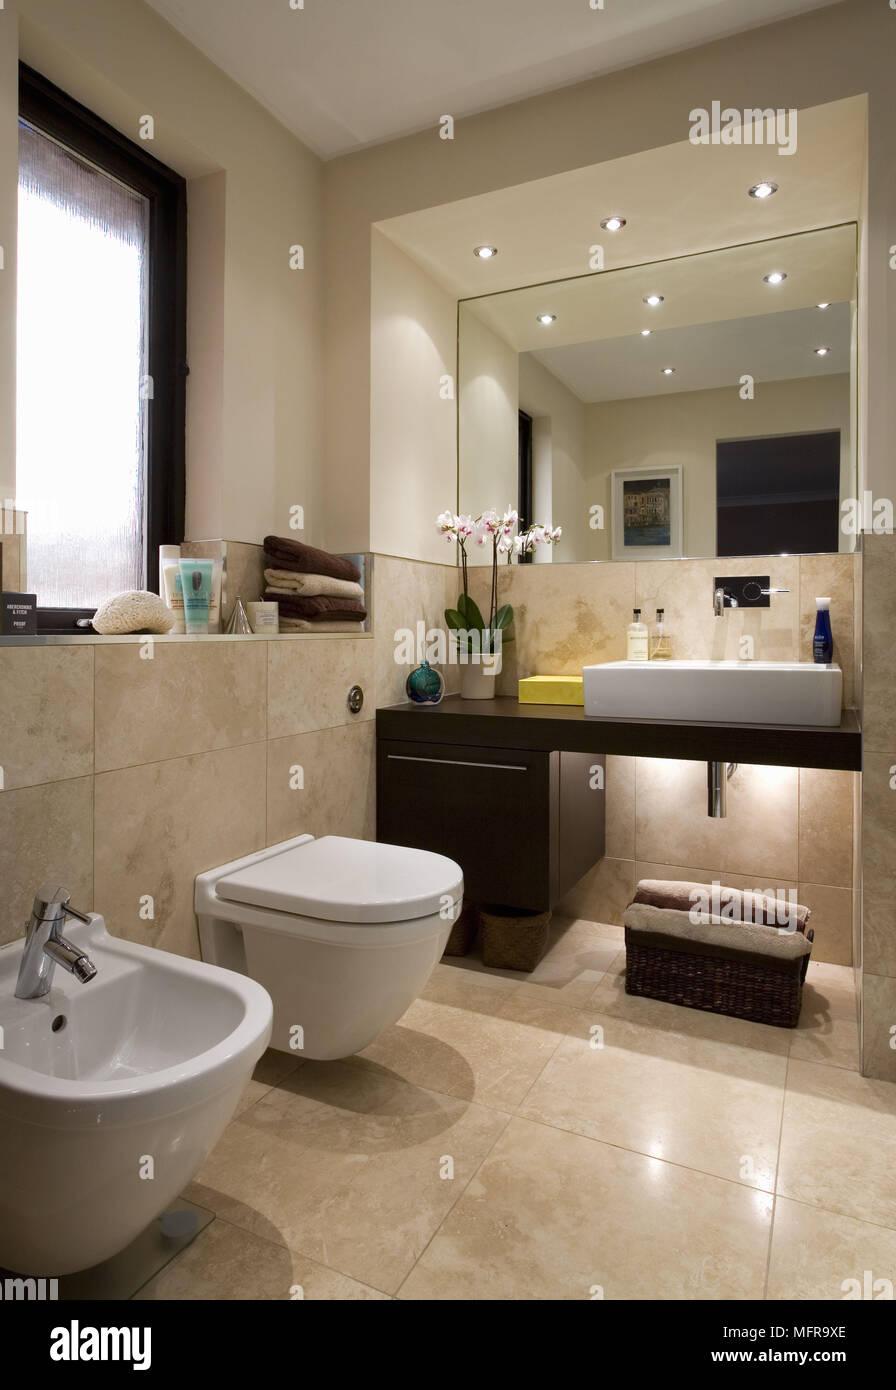 Mirror Above Washbasin Set On Shelf Unit In Modern Bathroom With Toilet And  Bidet Below Window